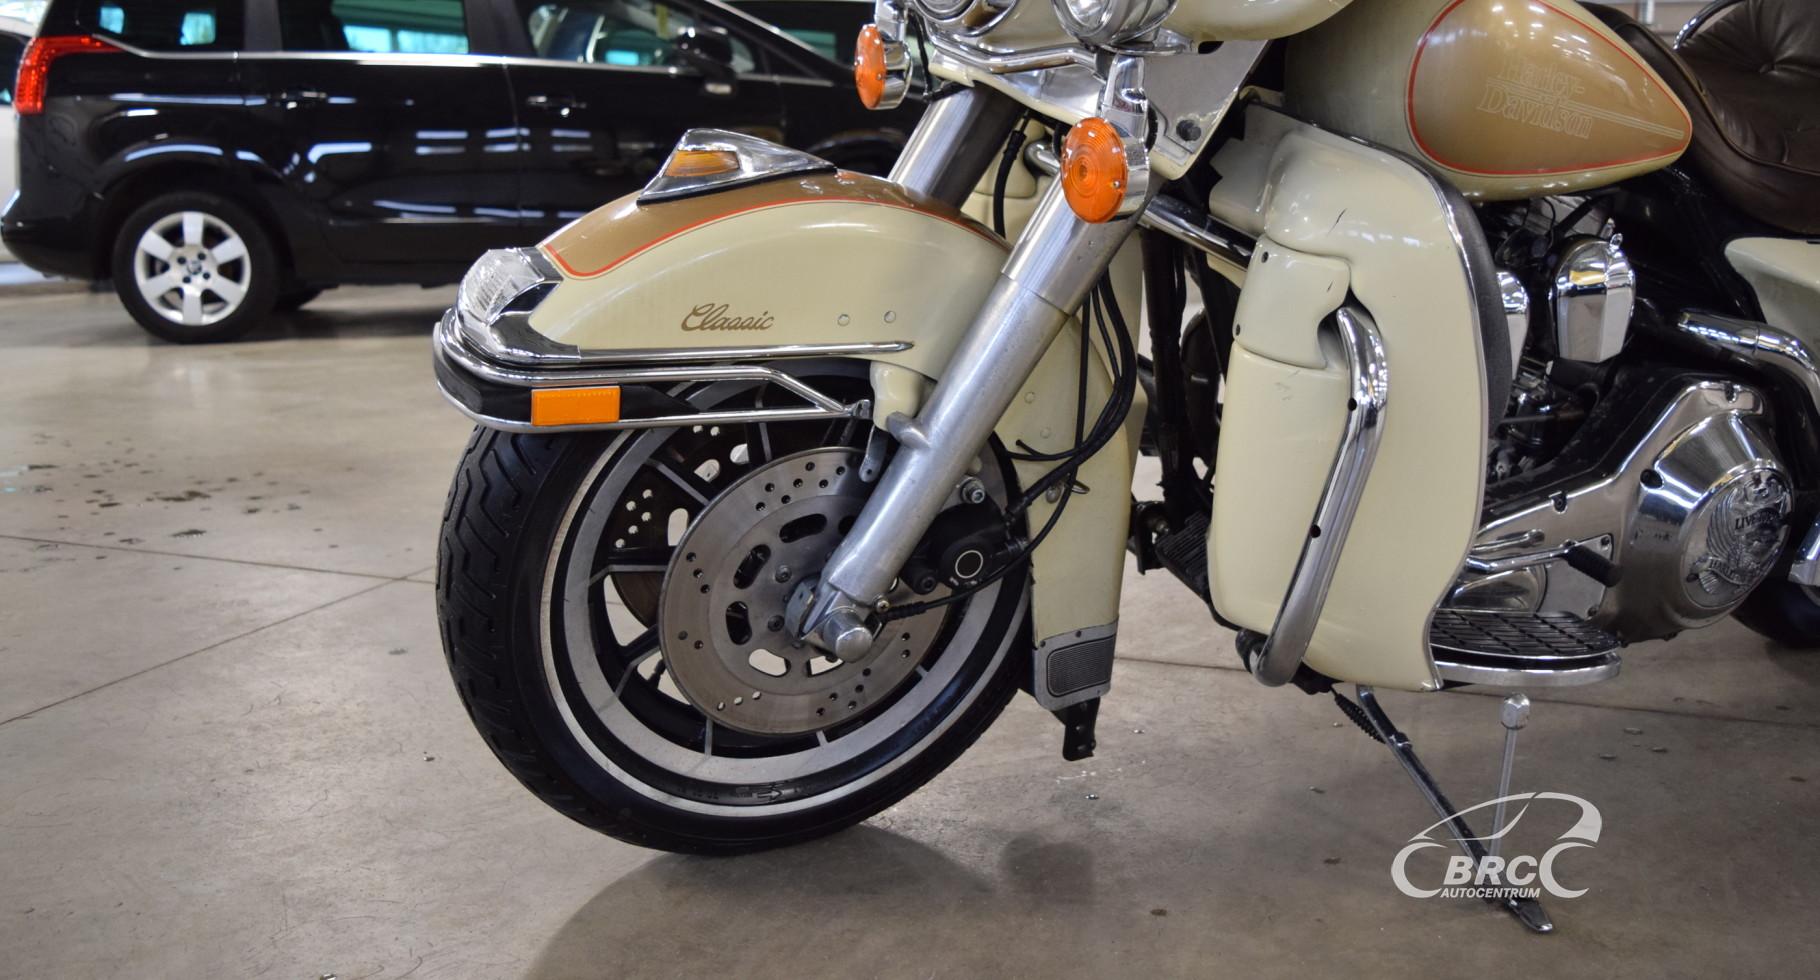 Harley-Davidson FLHTC